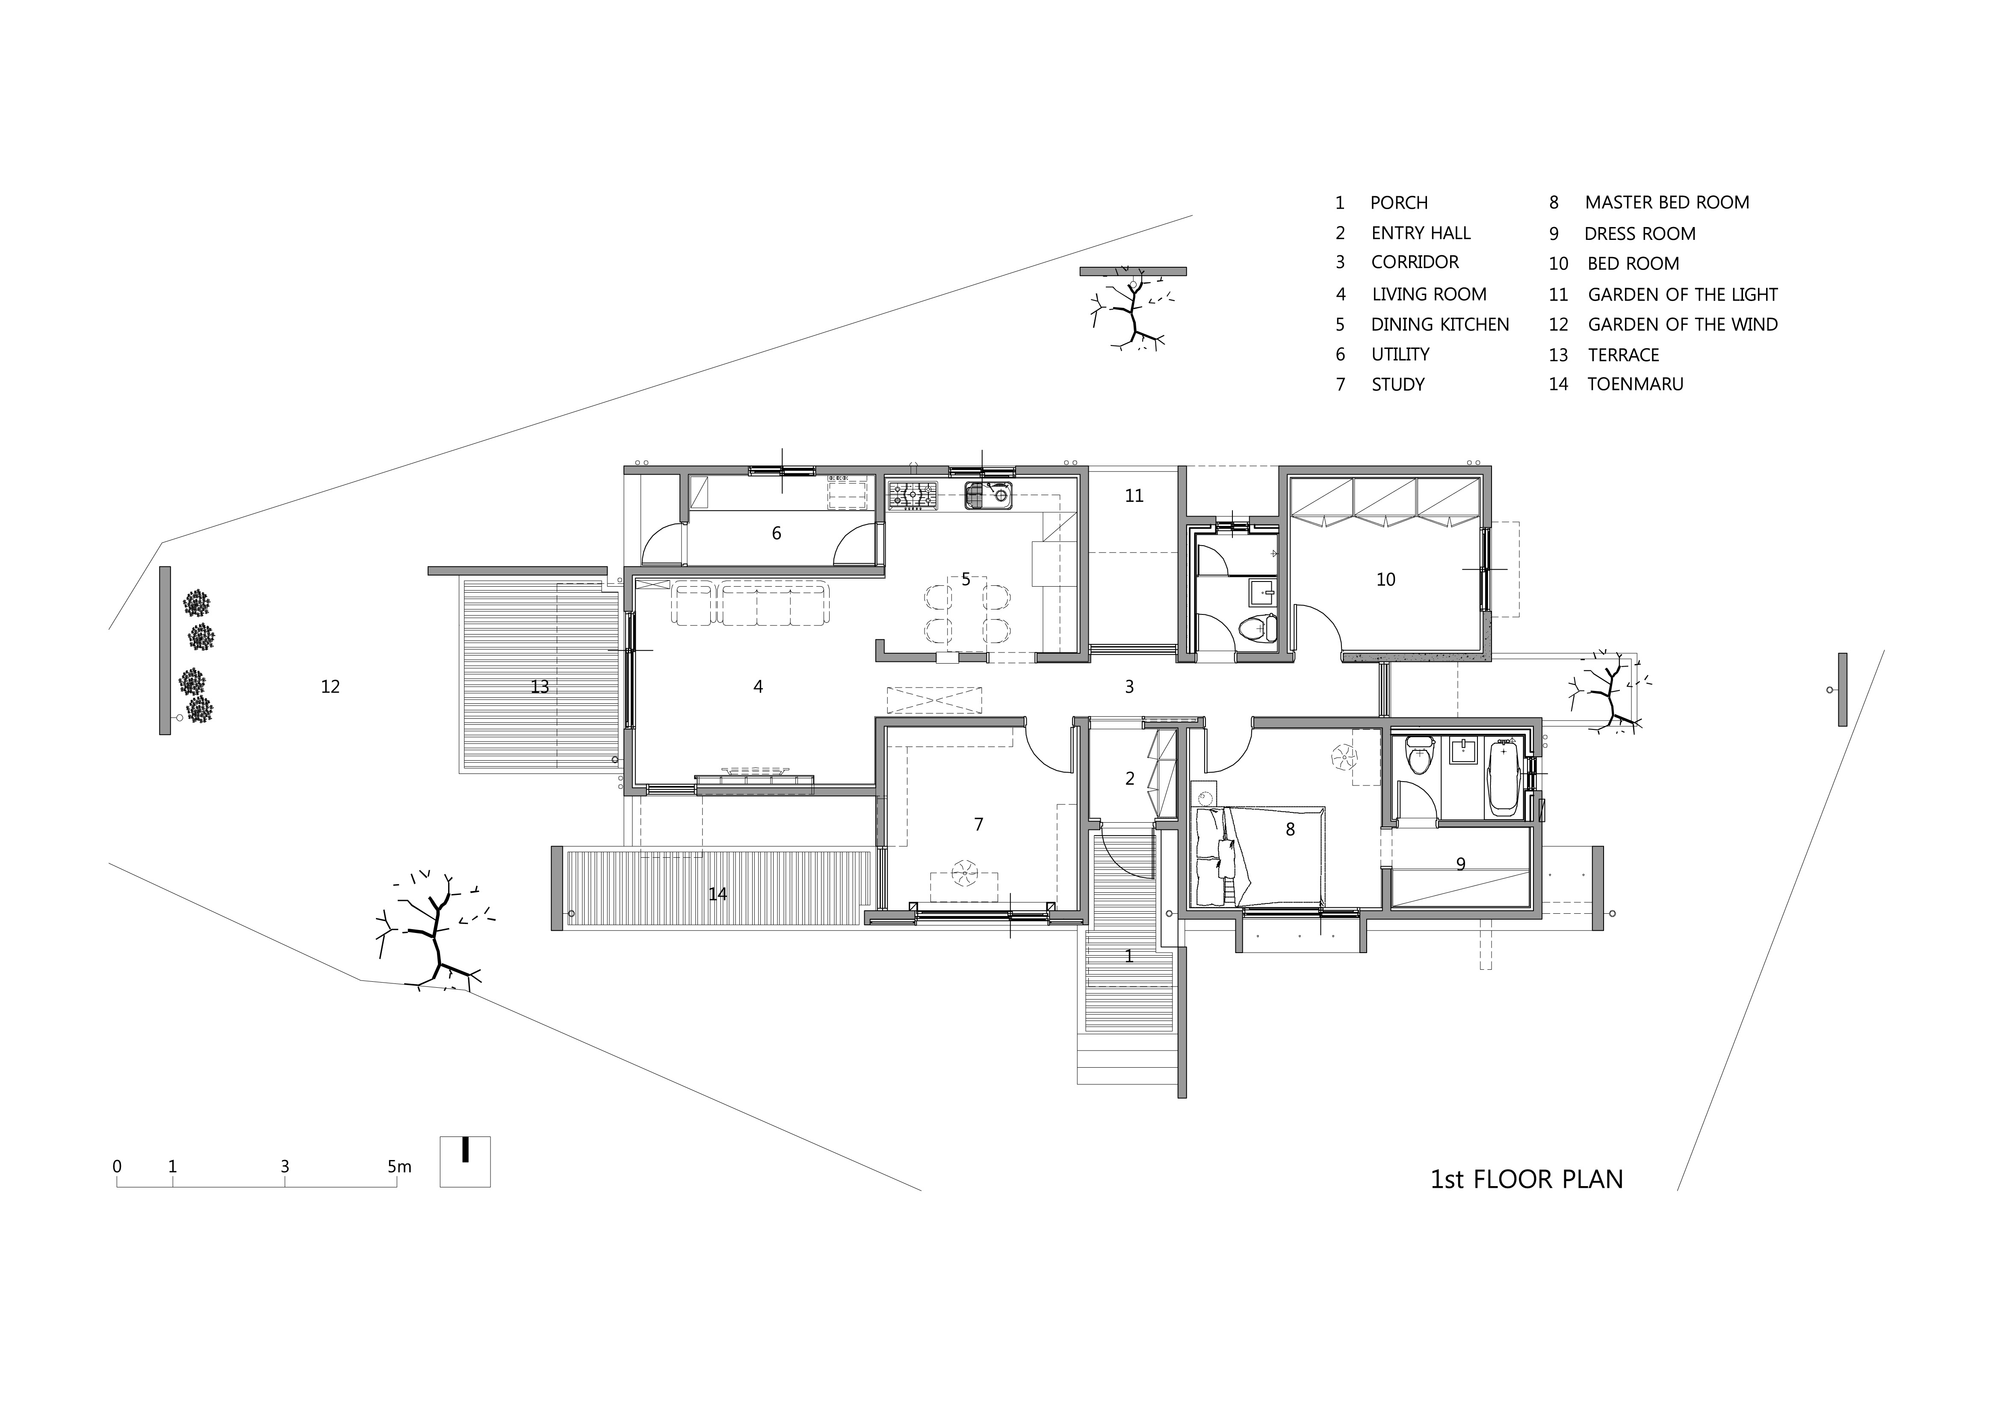 52f1a63ae8e44e0b6d0000da_mun-jeong-heon-a-m-architects_floorplan